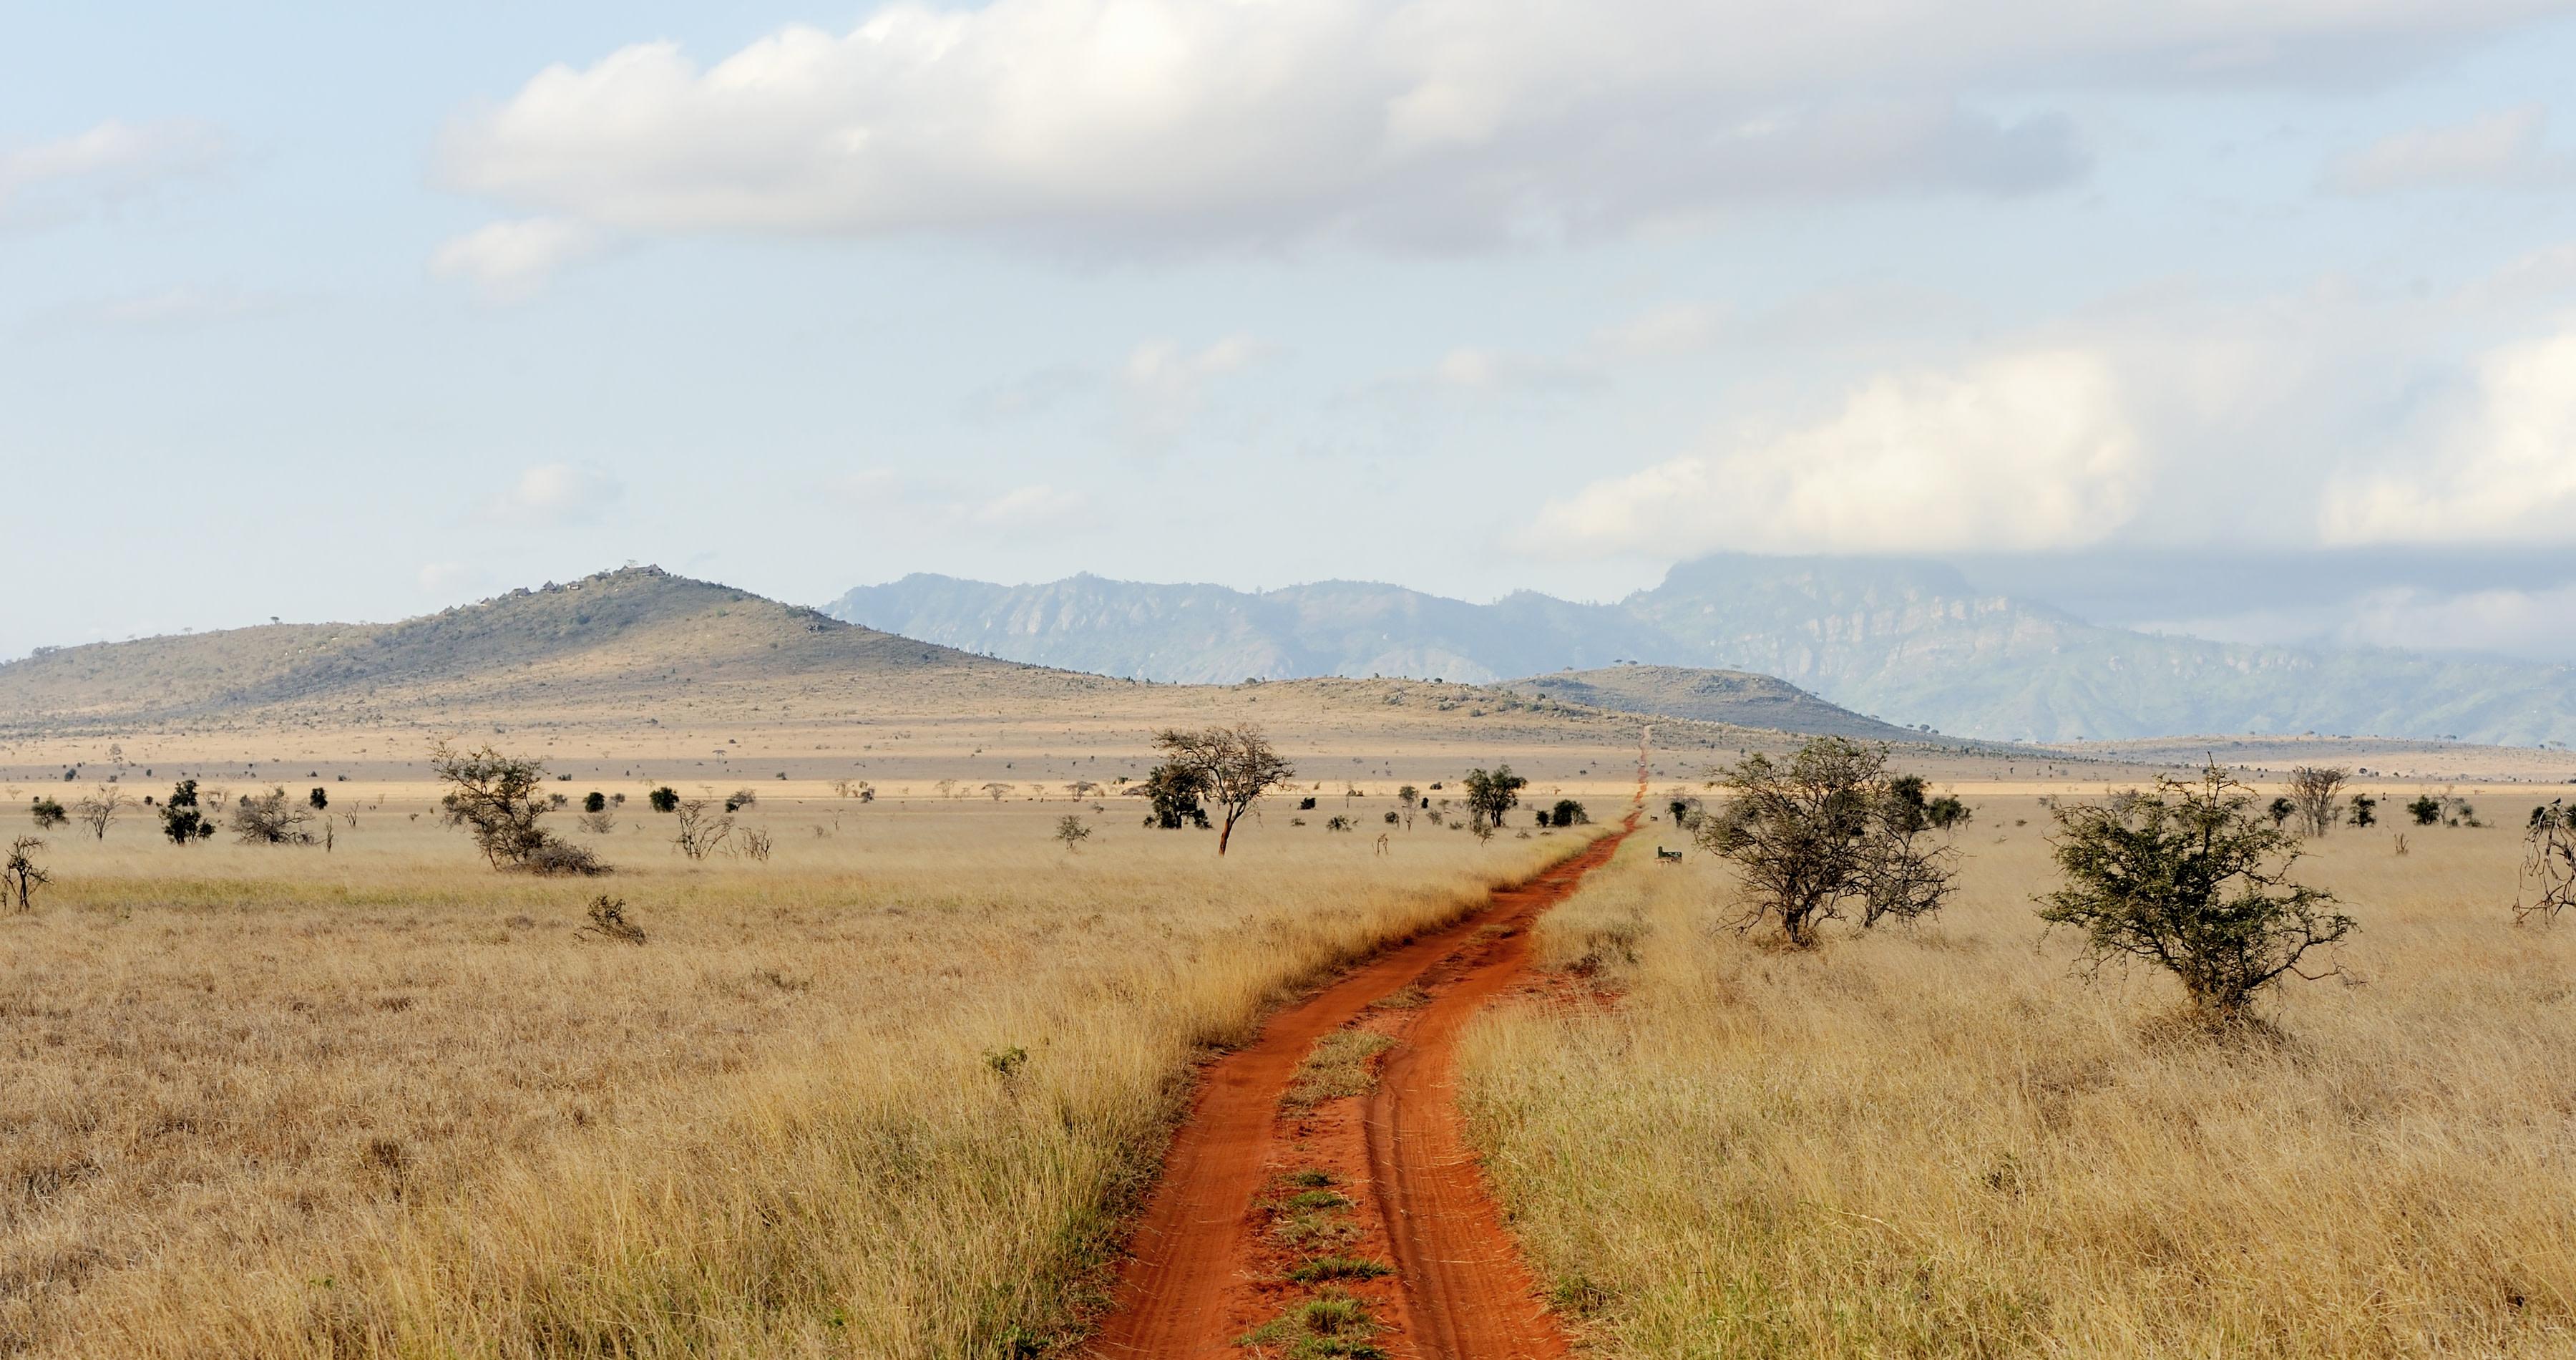 Savannah landscape in the National park in Kenya, Africa